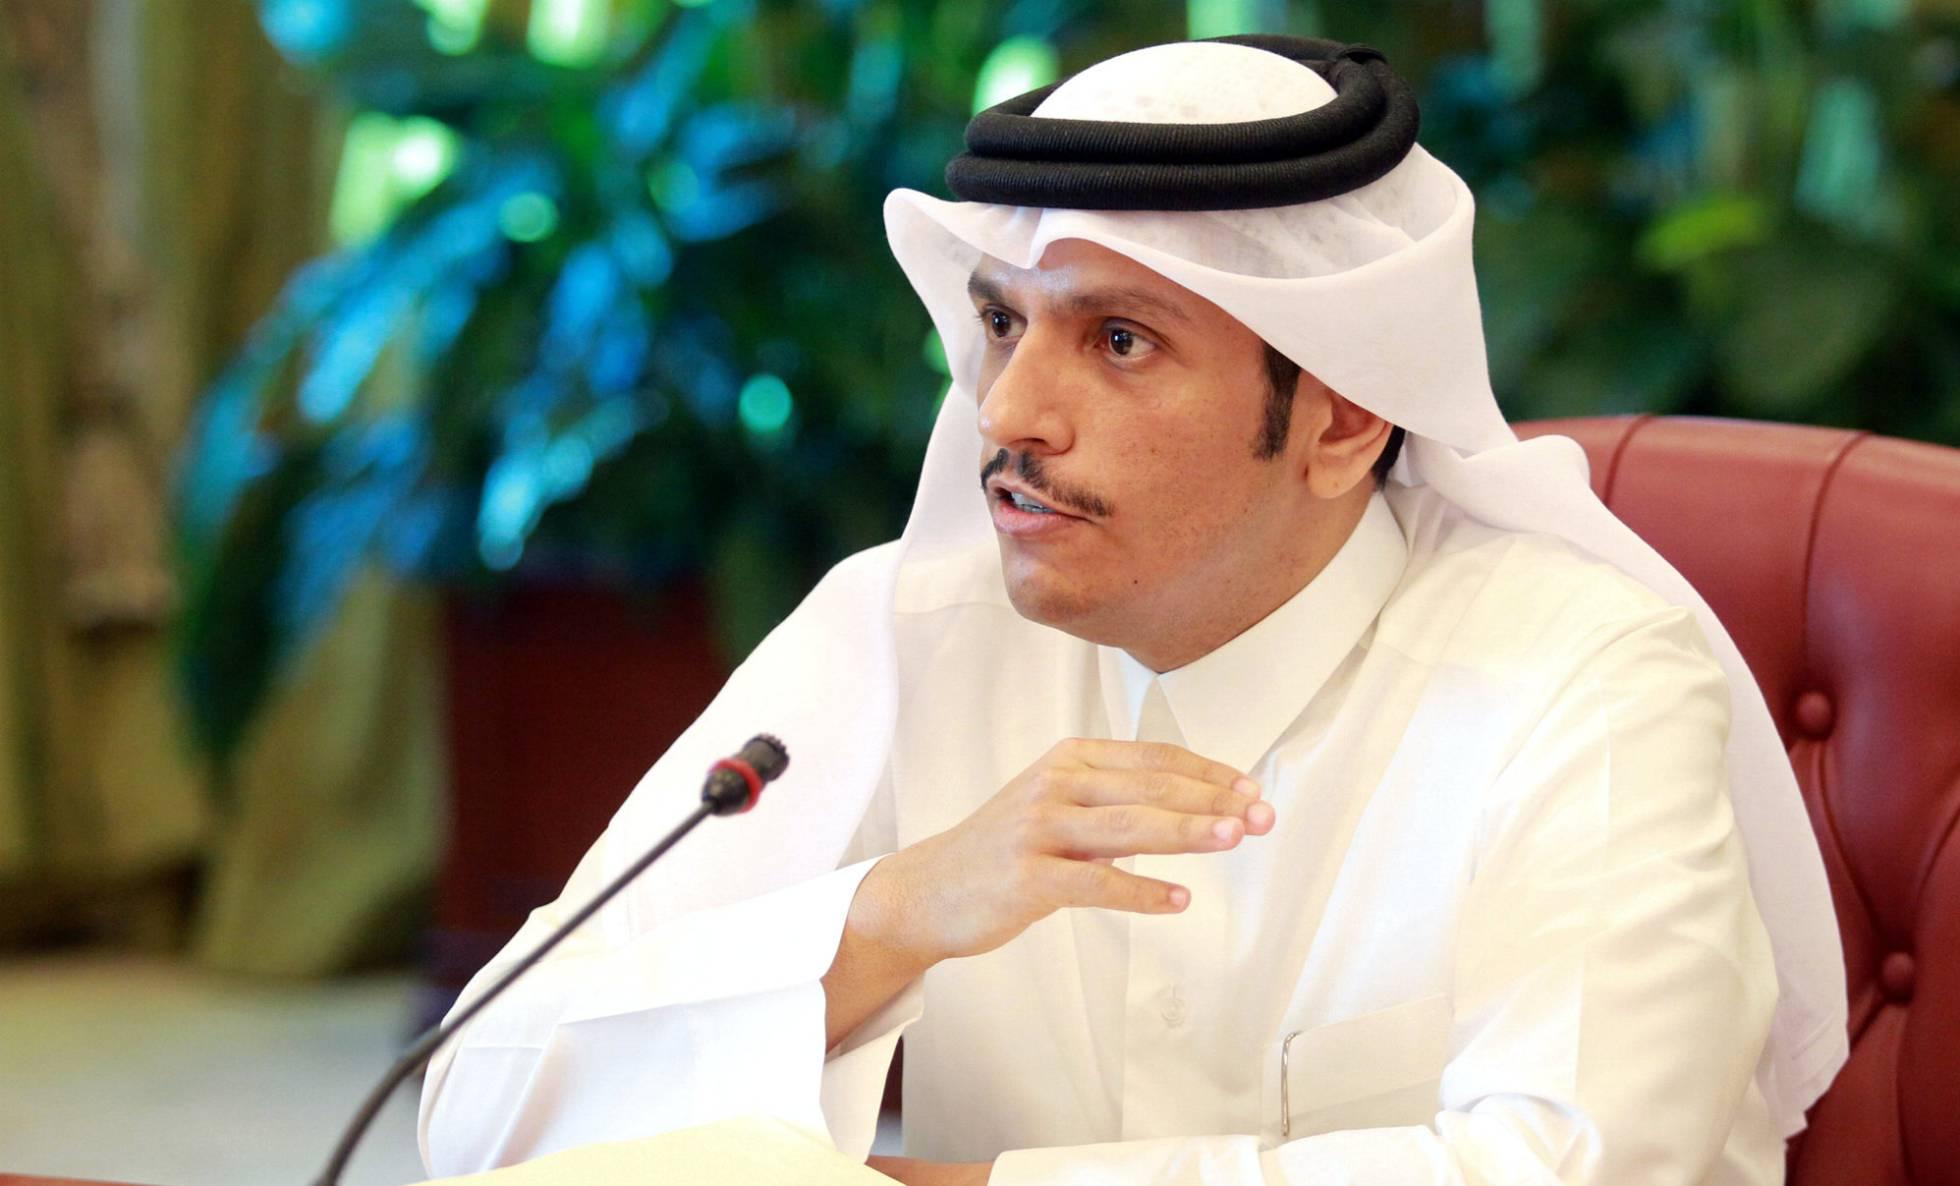 Arabia Saudita, Egipto, Bahréin y Emiratos Árabes Unidos cortaron relaciones diplomáticas con Qatar 1496944449_125672_1496945773_noticia_normal_recorte1